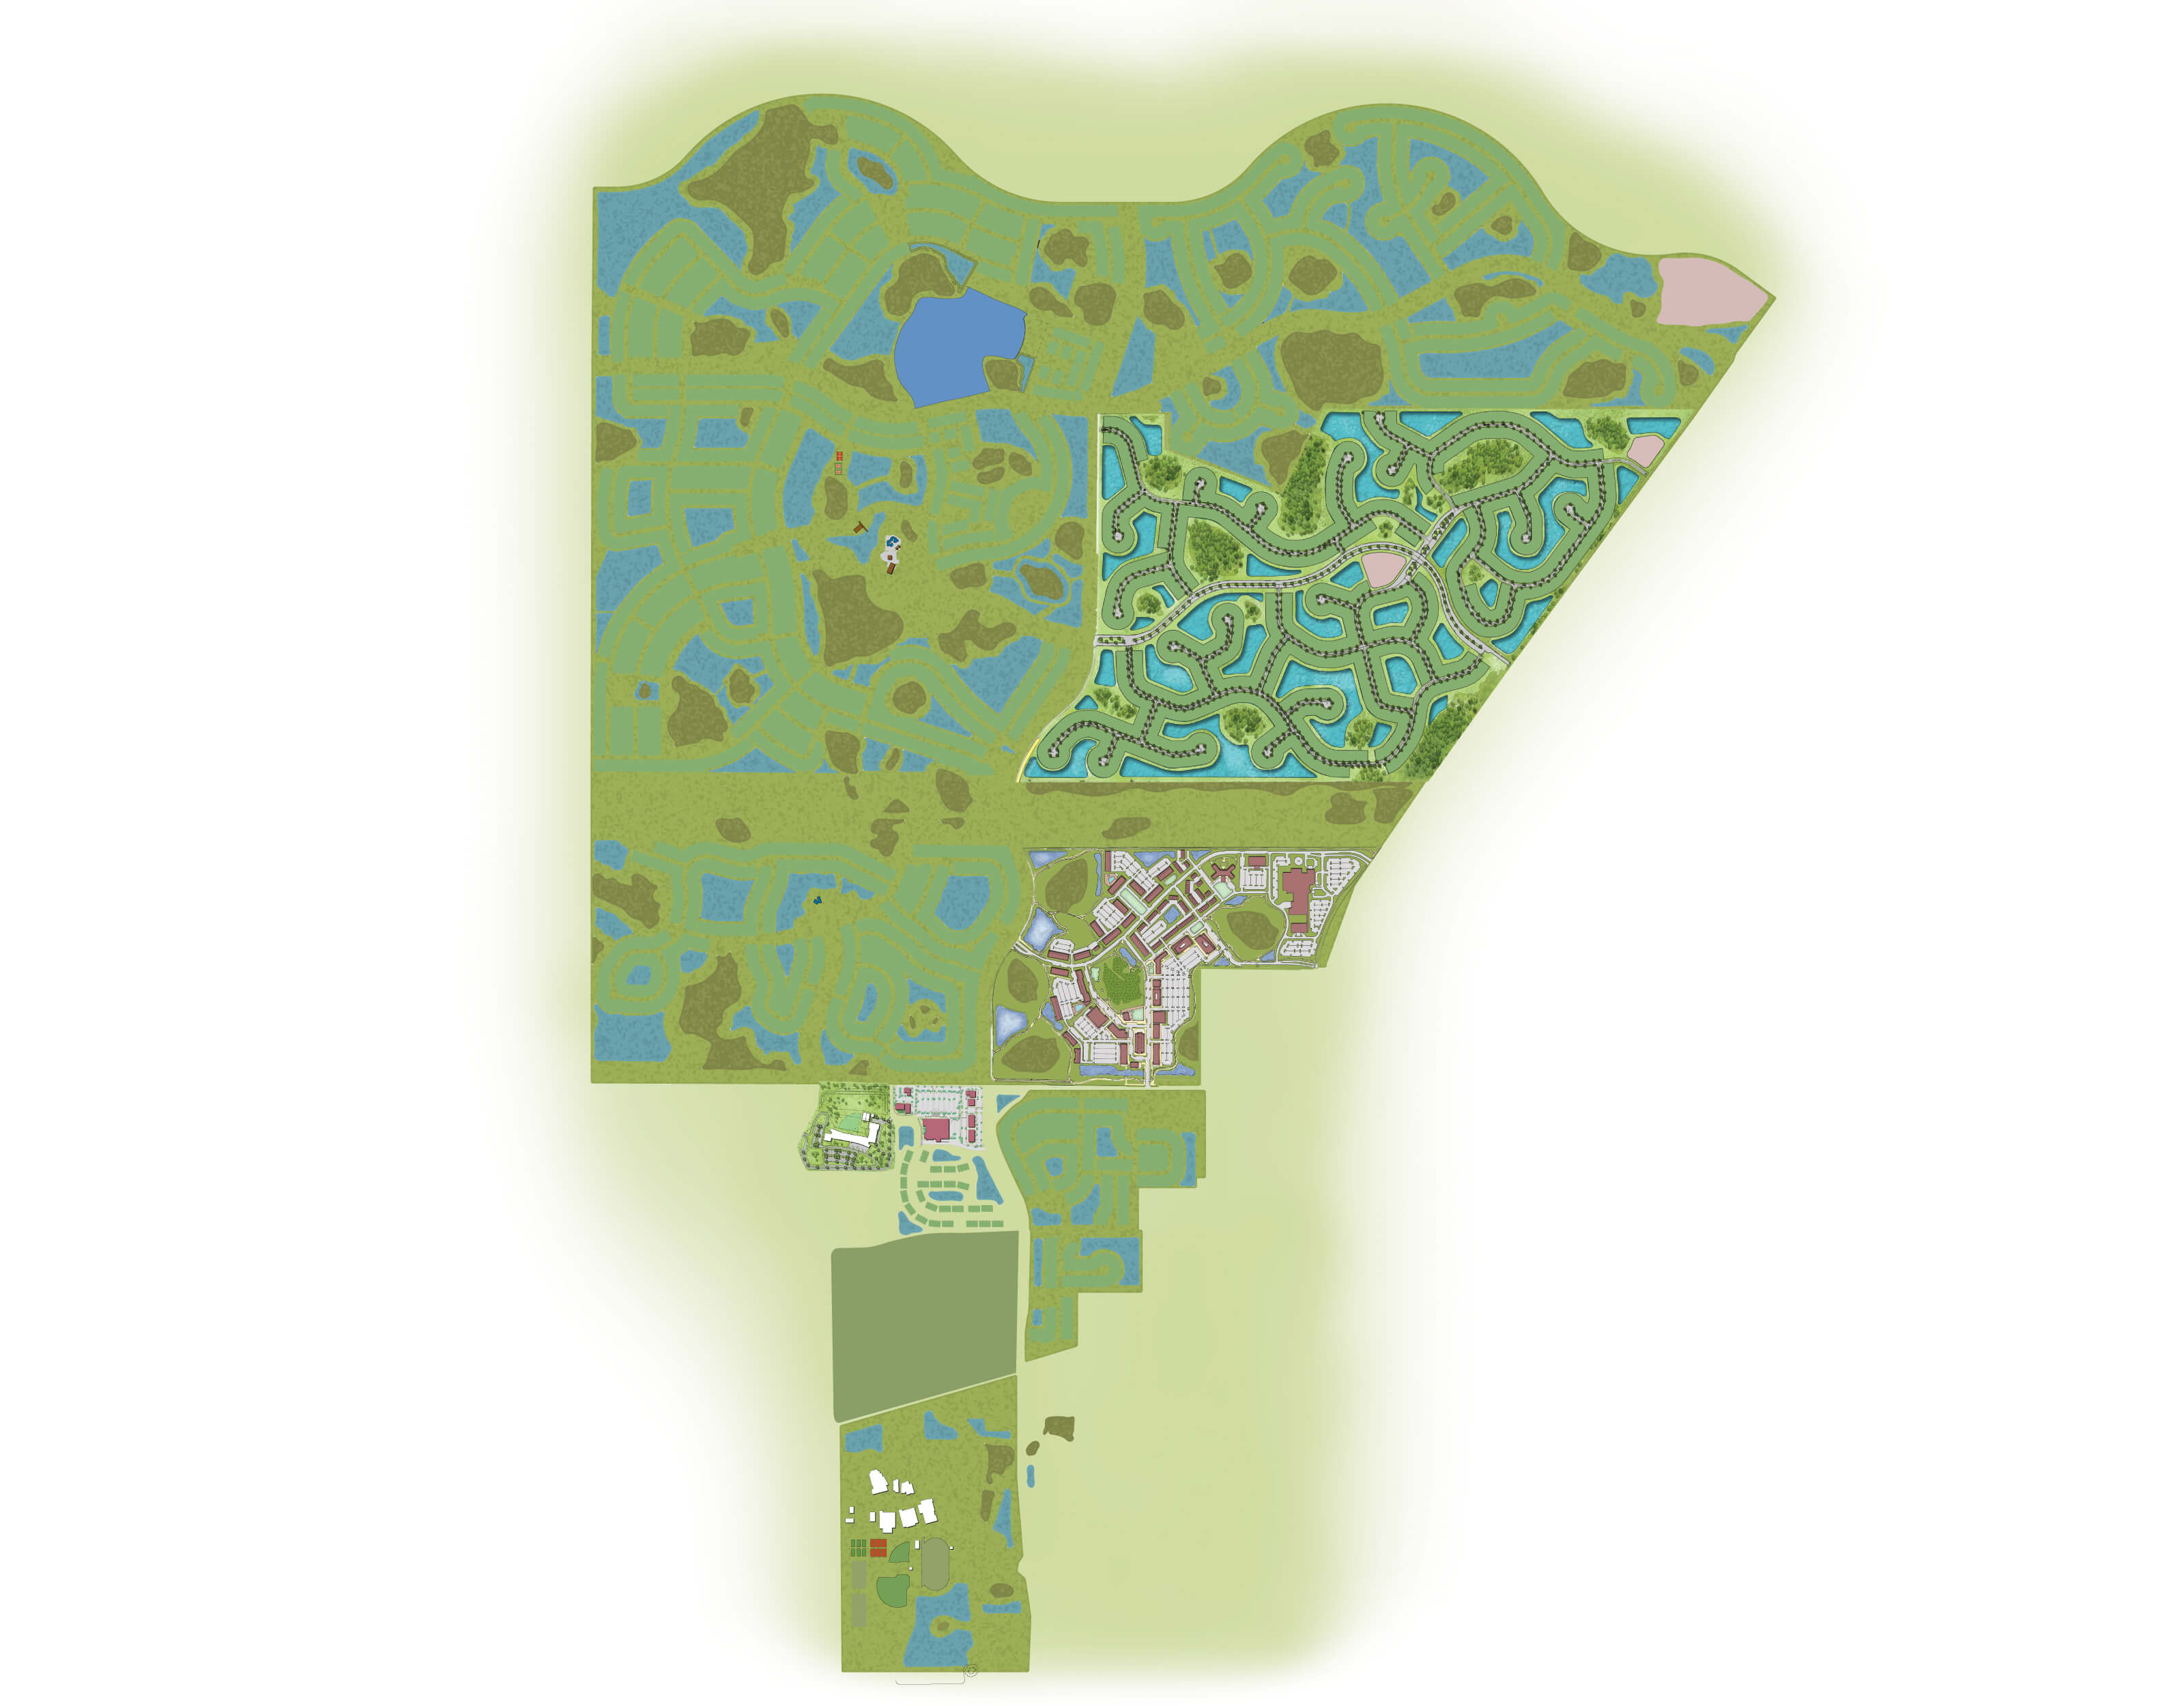 Neighborhoods site plan background